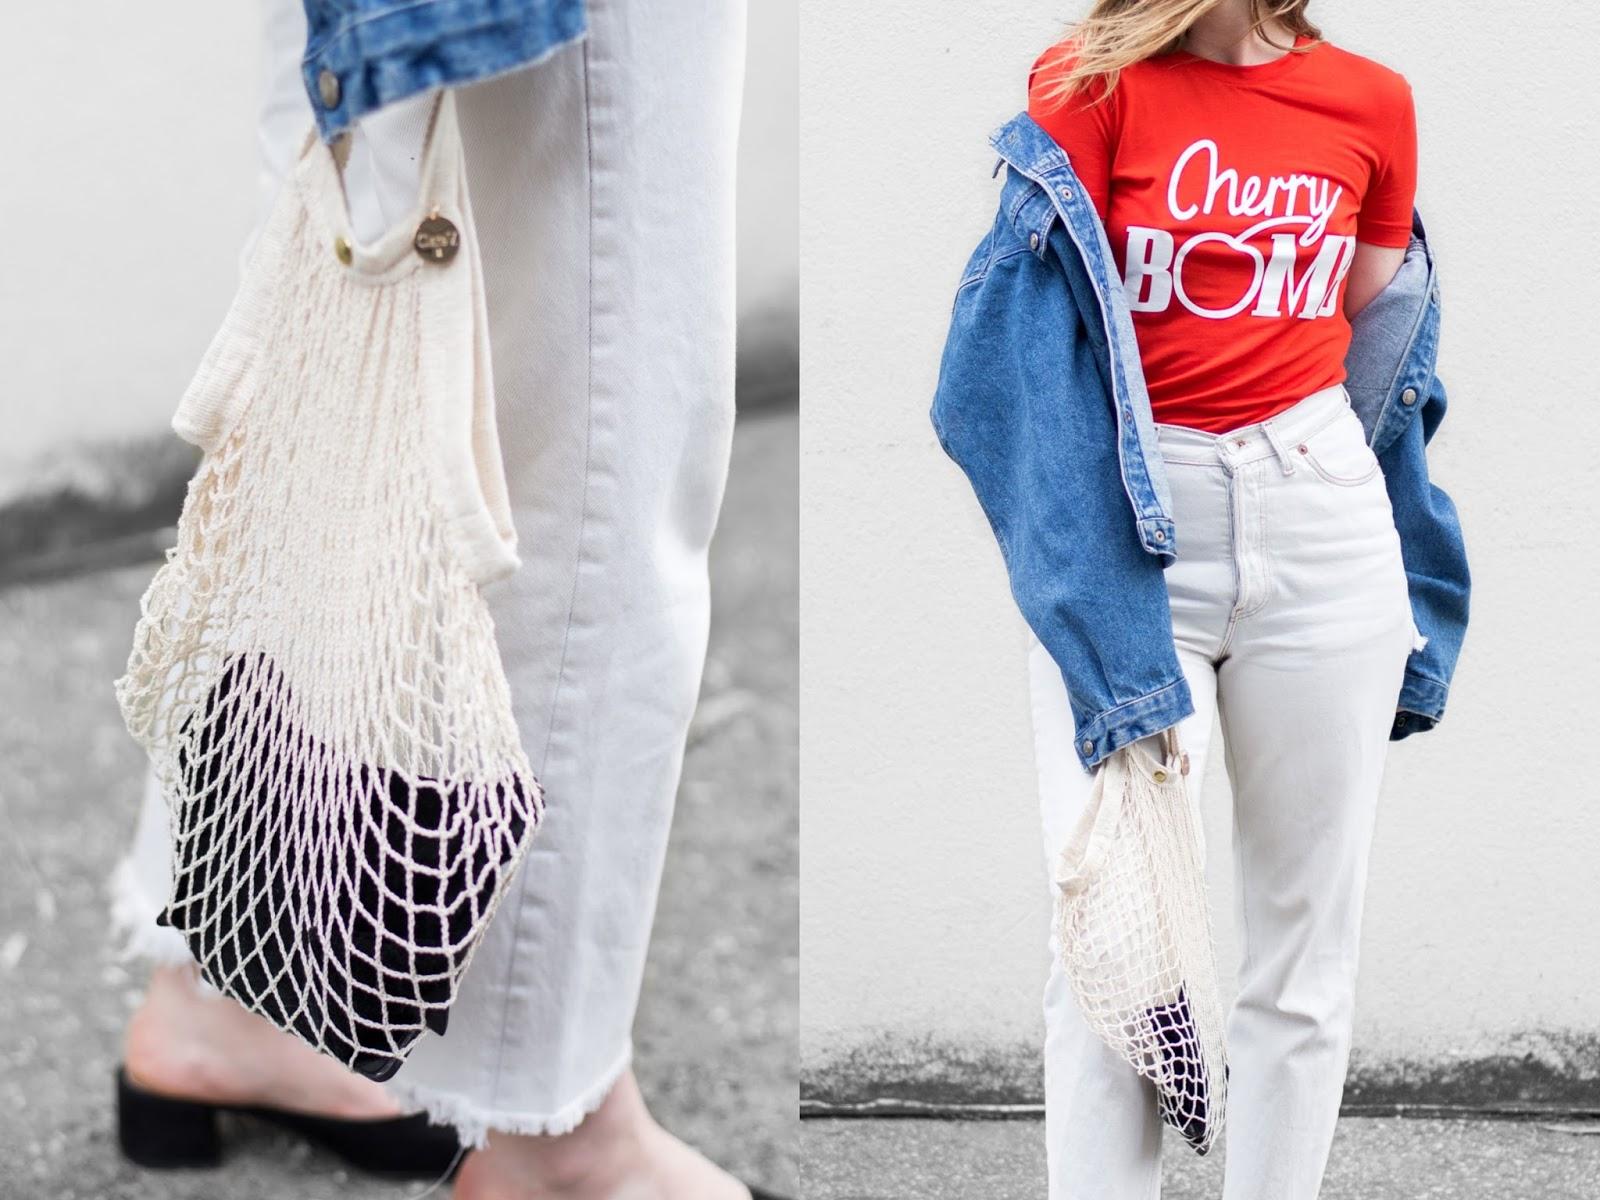 Favorite outfit - Scandinavian designer t-shirt - Ganni - Clare V. netty bag